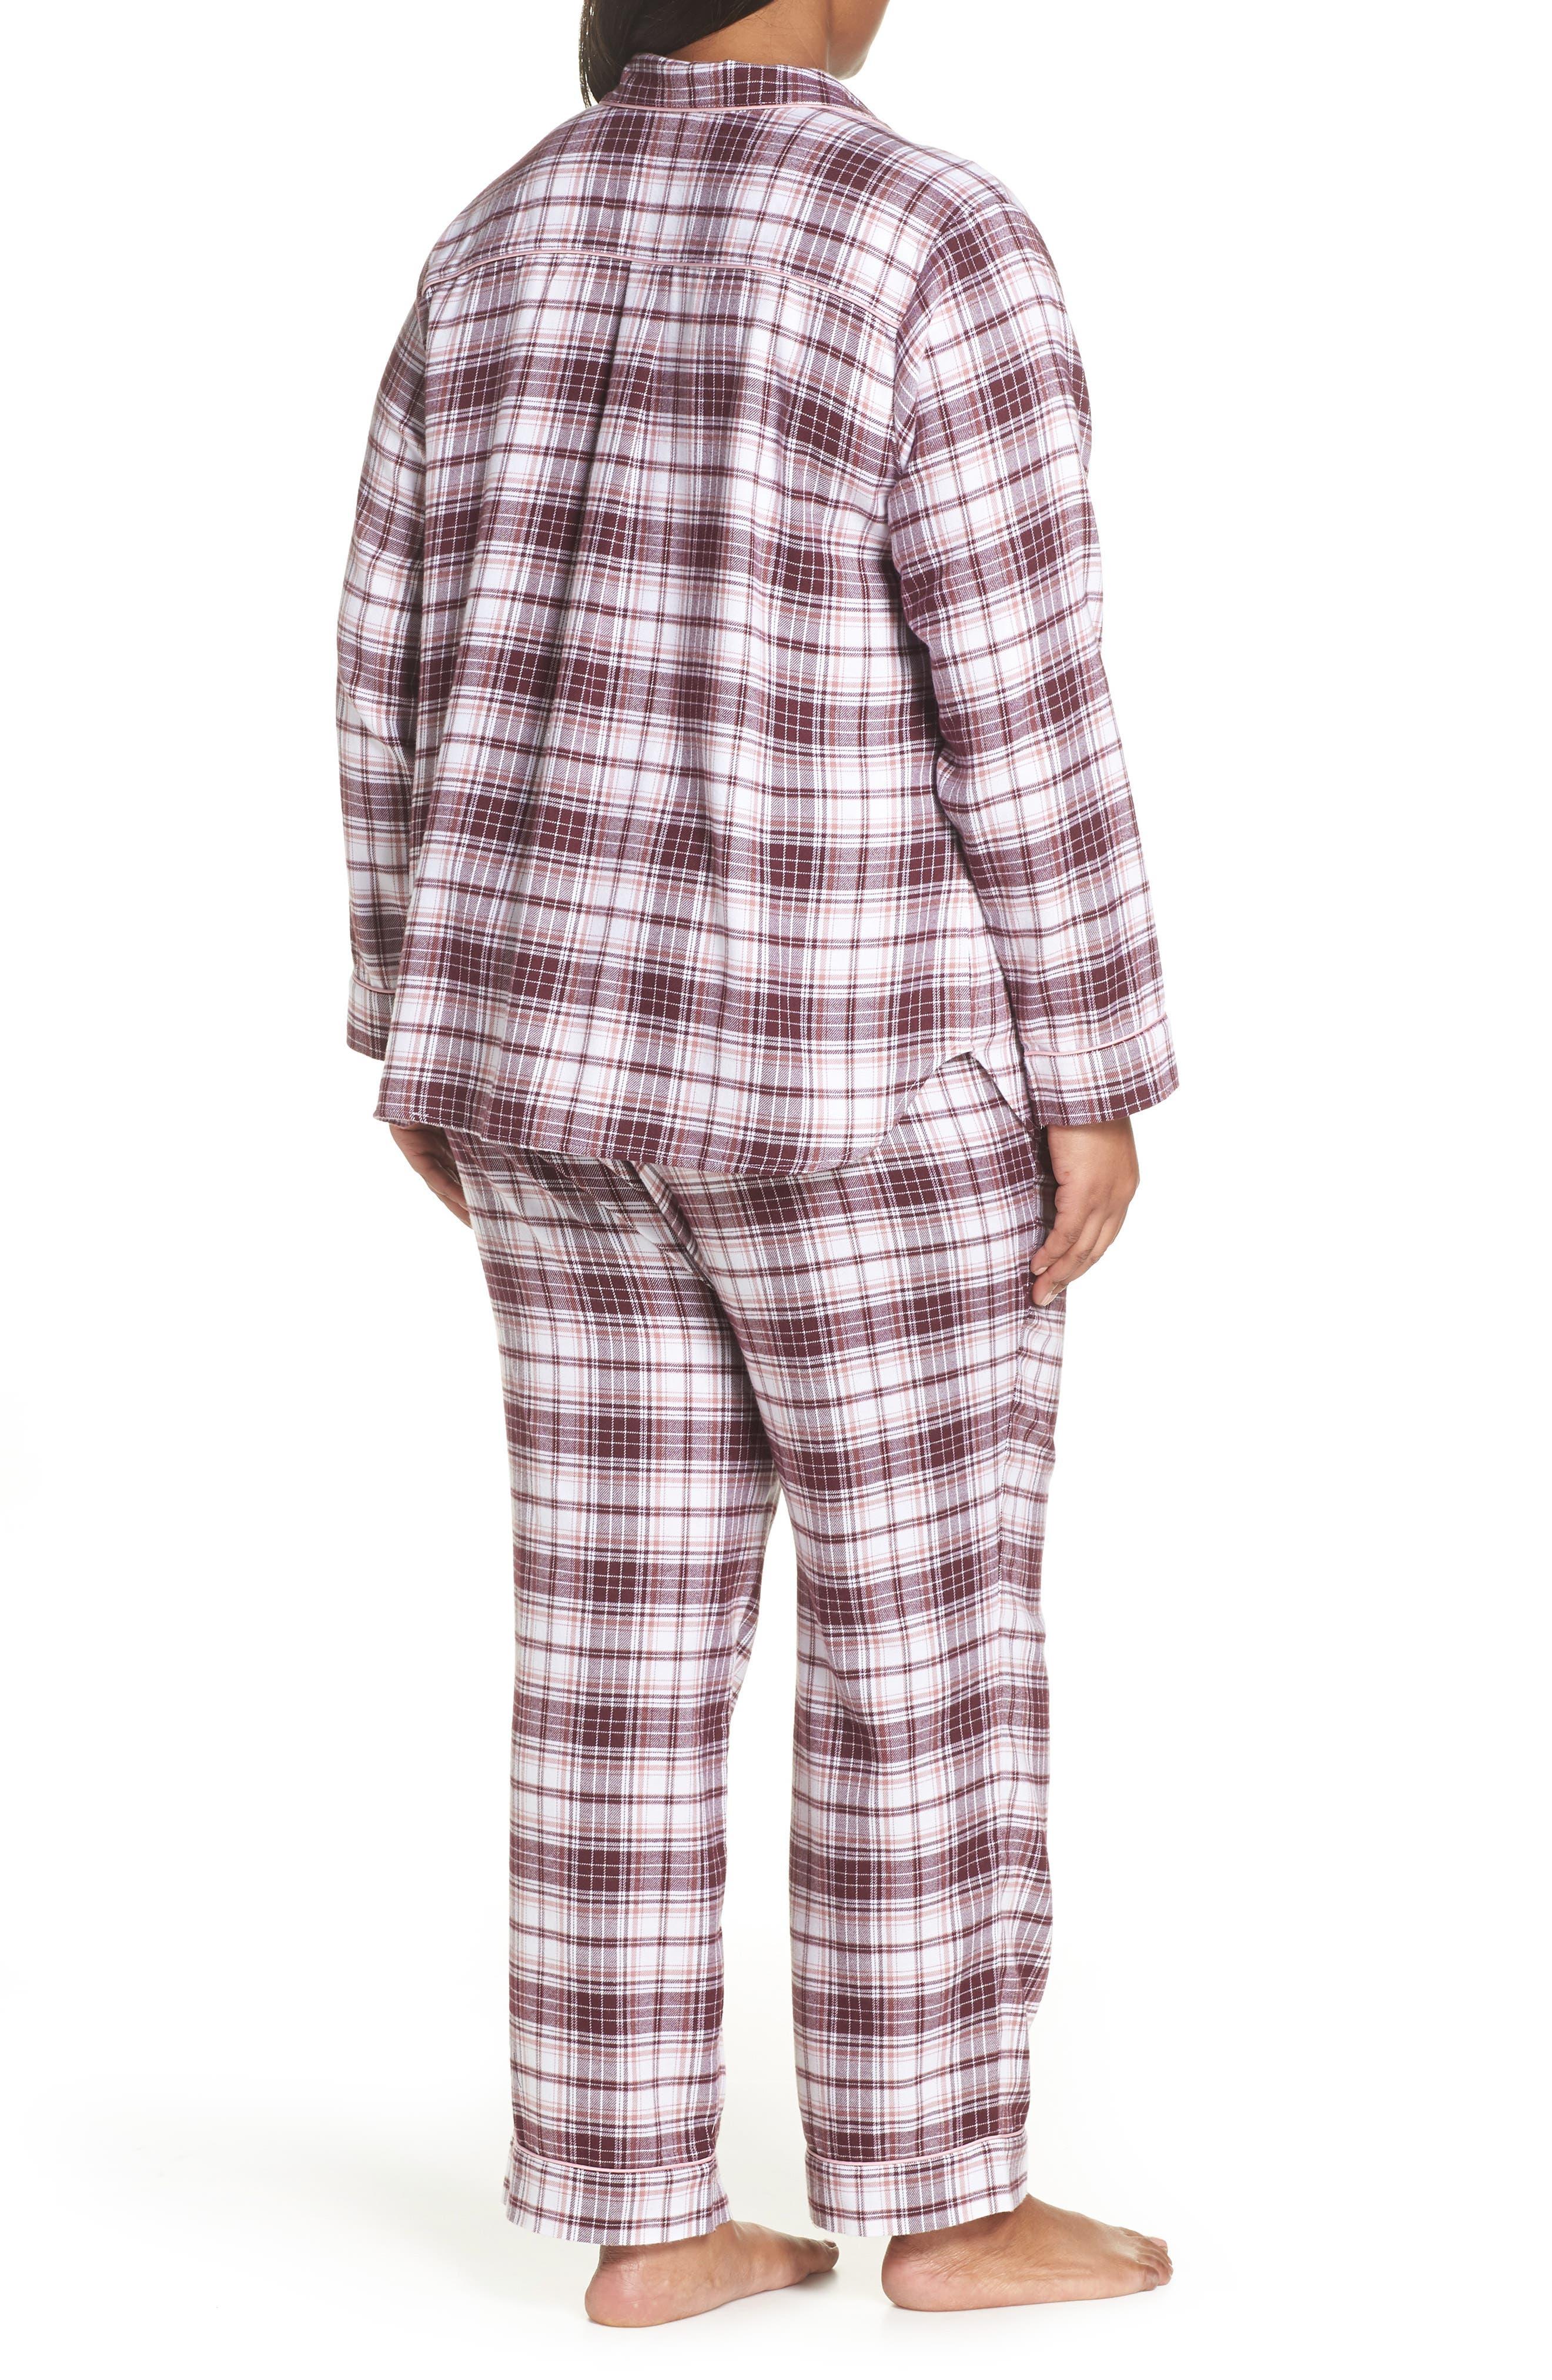 Raven Plaid Pajamas,                             Alternate thumbnail 2, color,                             PORT PLAID